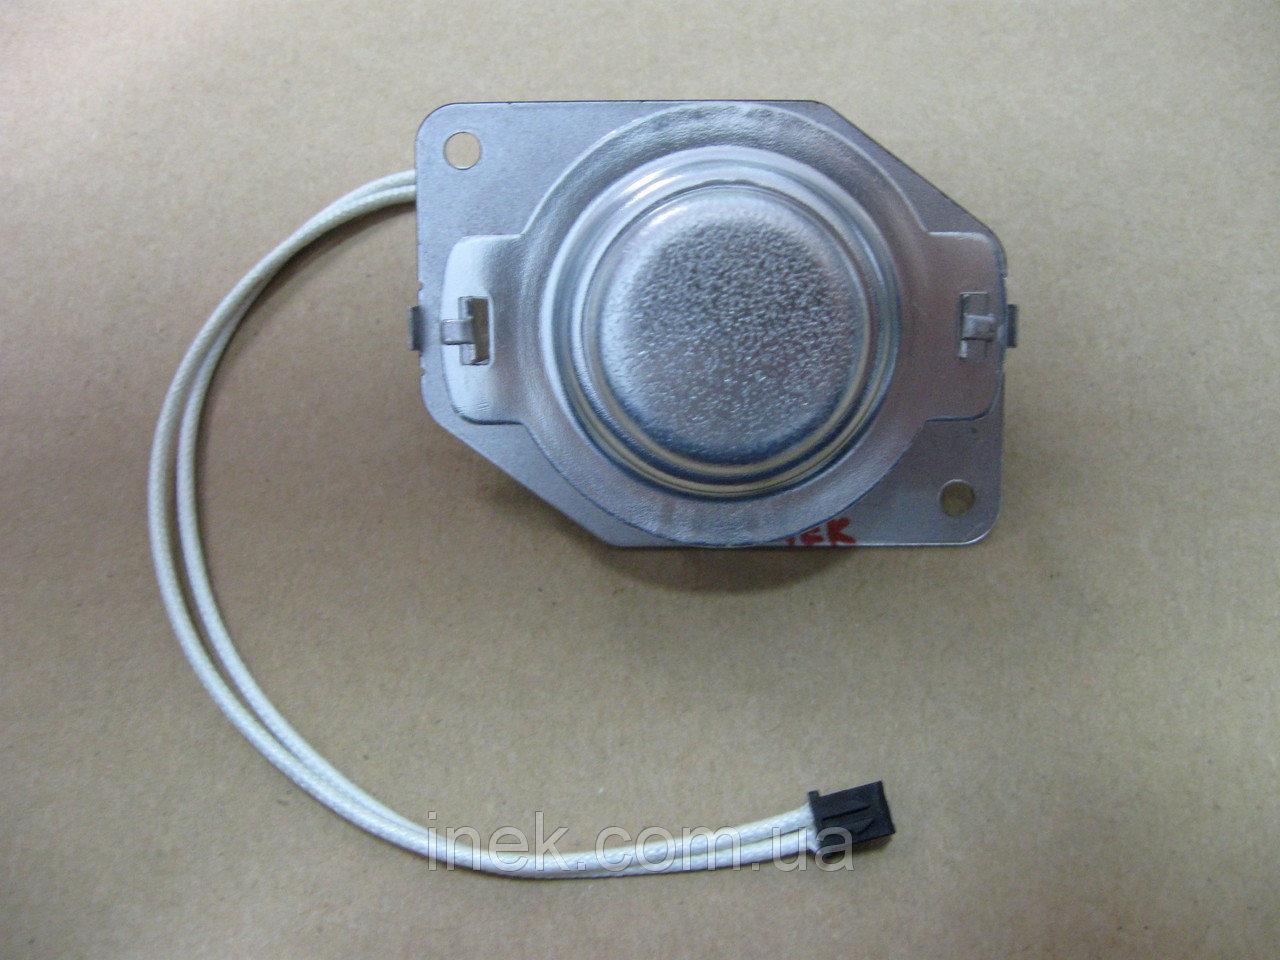 Нижний датчик температуры для мультиварки Redmond RMC-M23